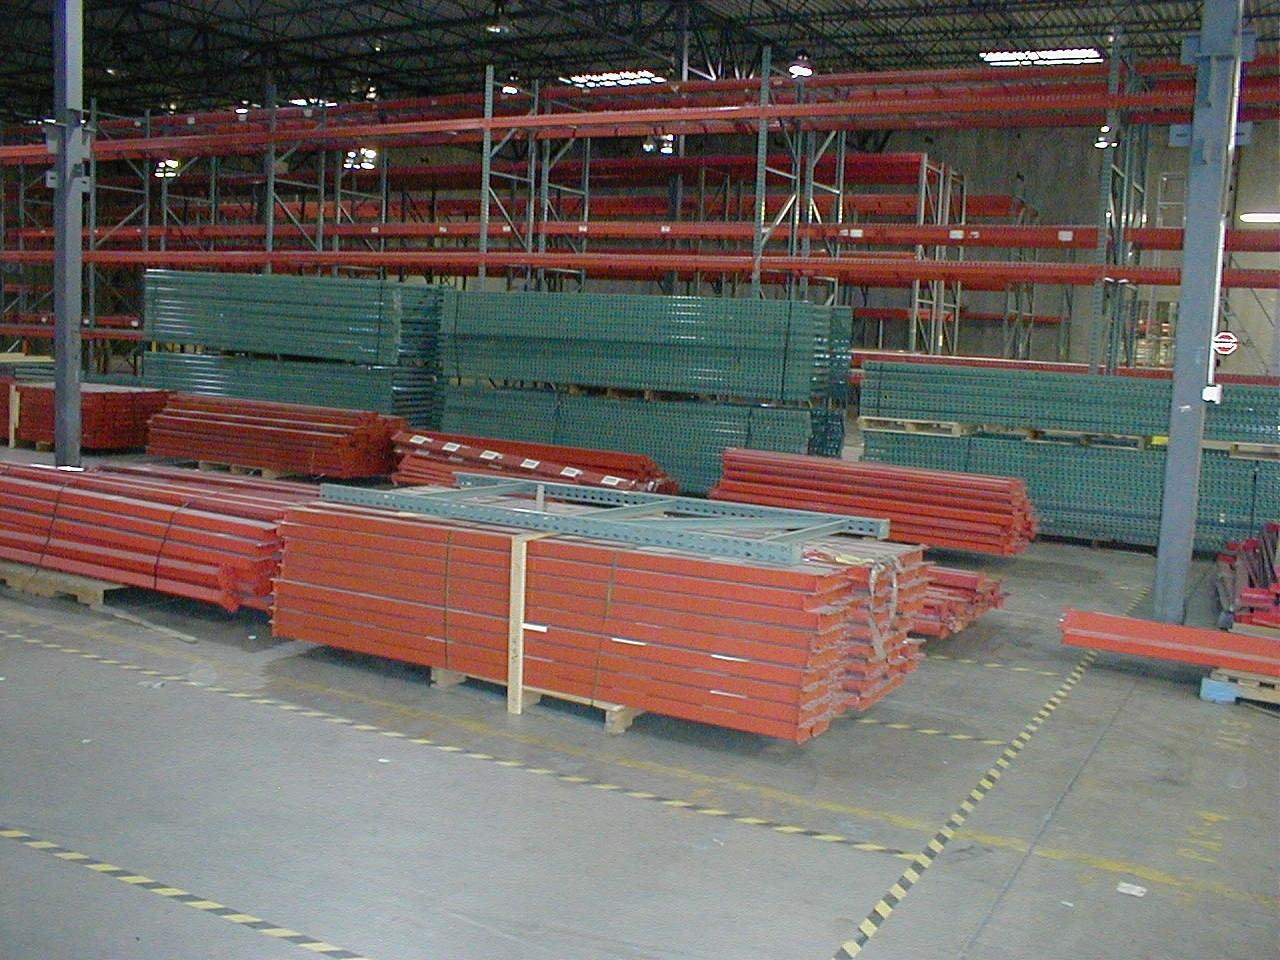 Preferred Equipment Company image 2